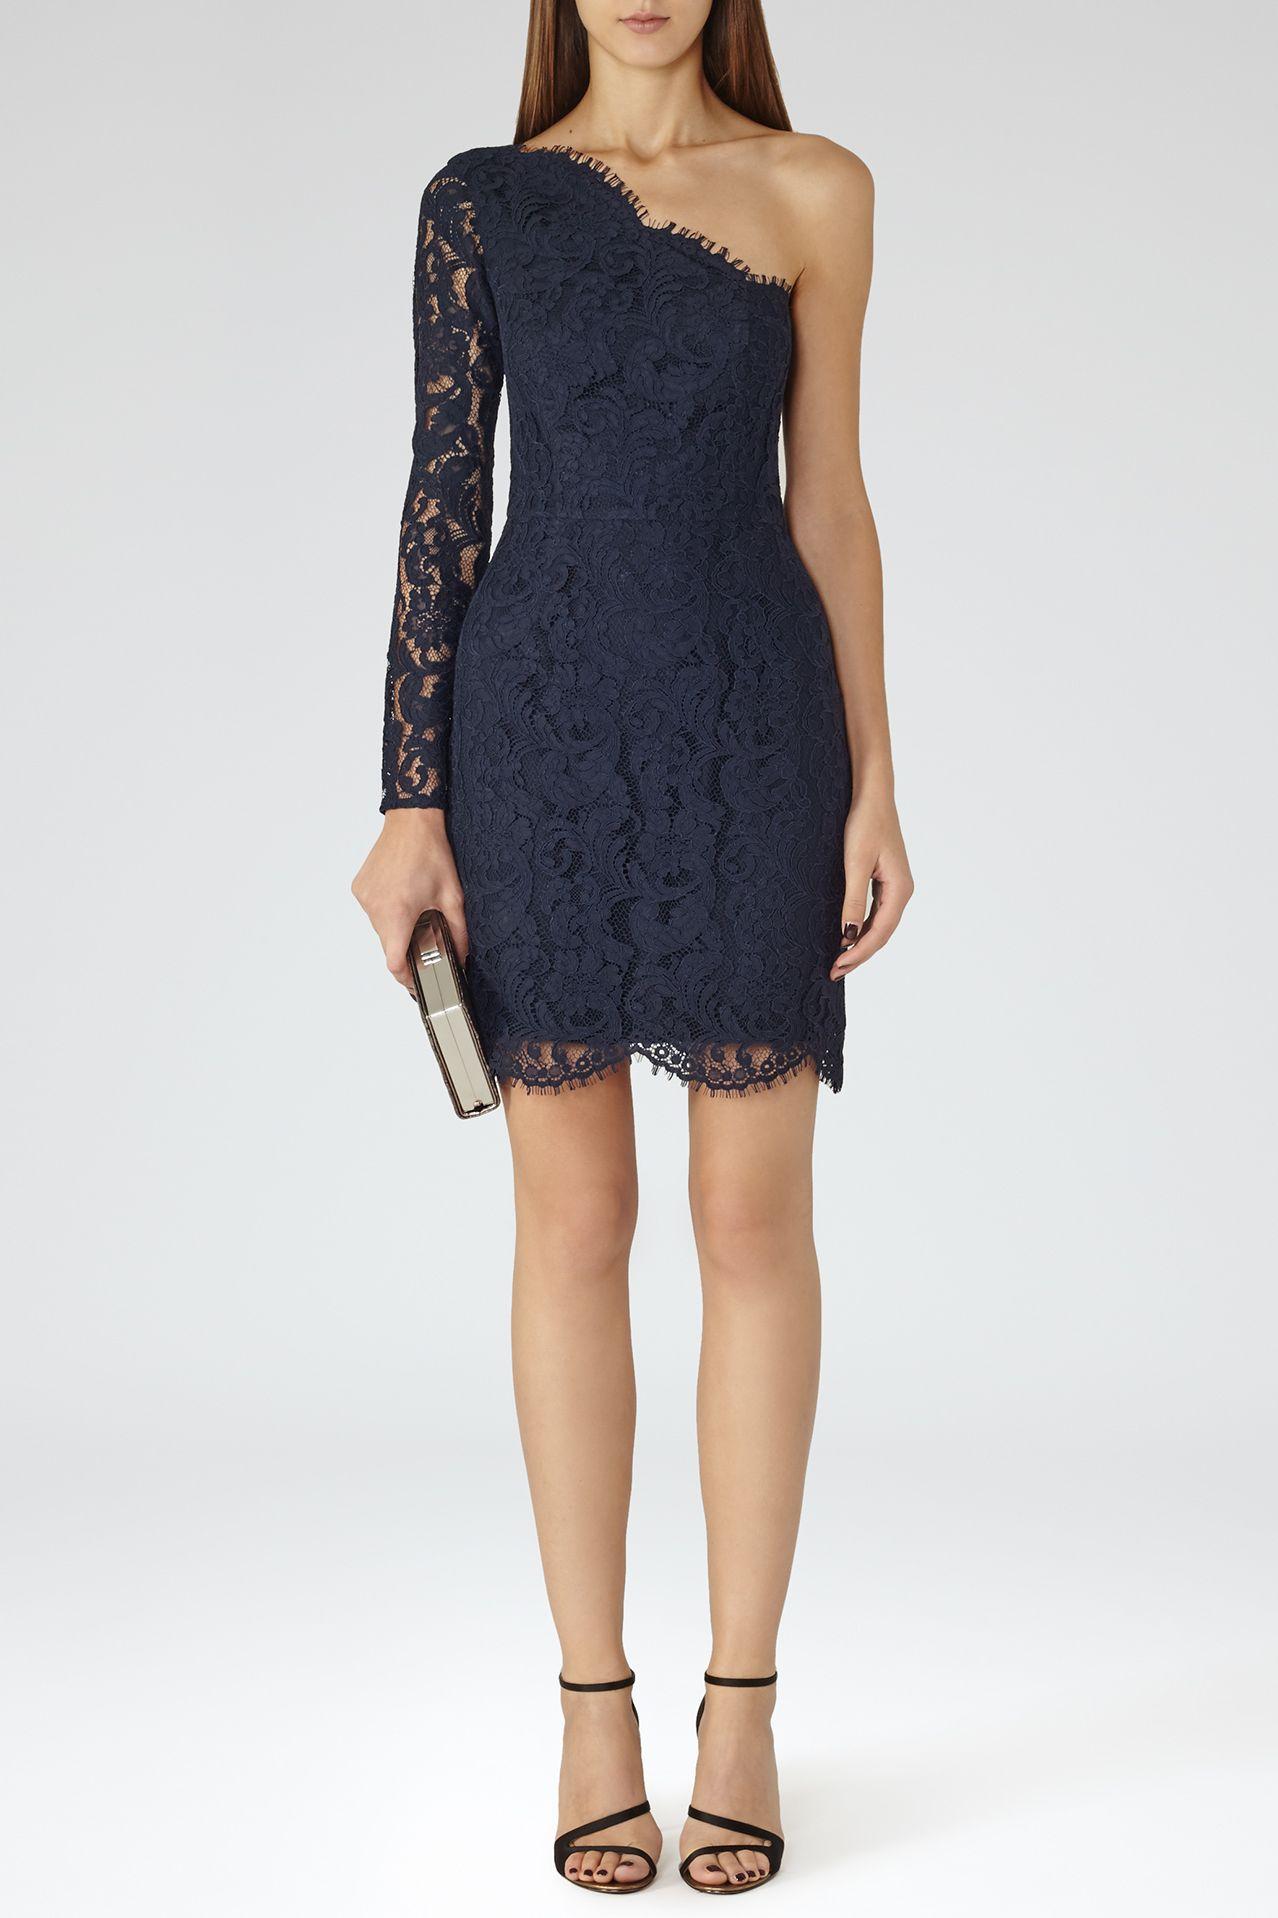 Reiss Leticia Asymmetric Lace Dress Preview Images